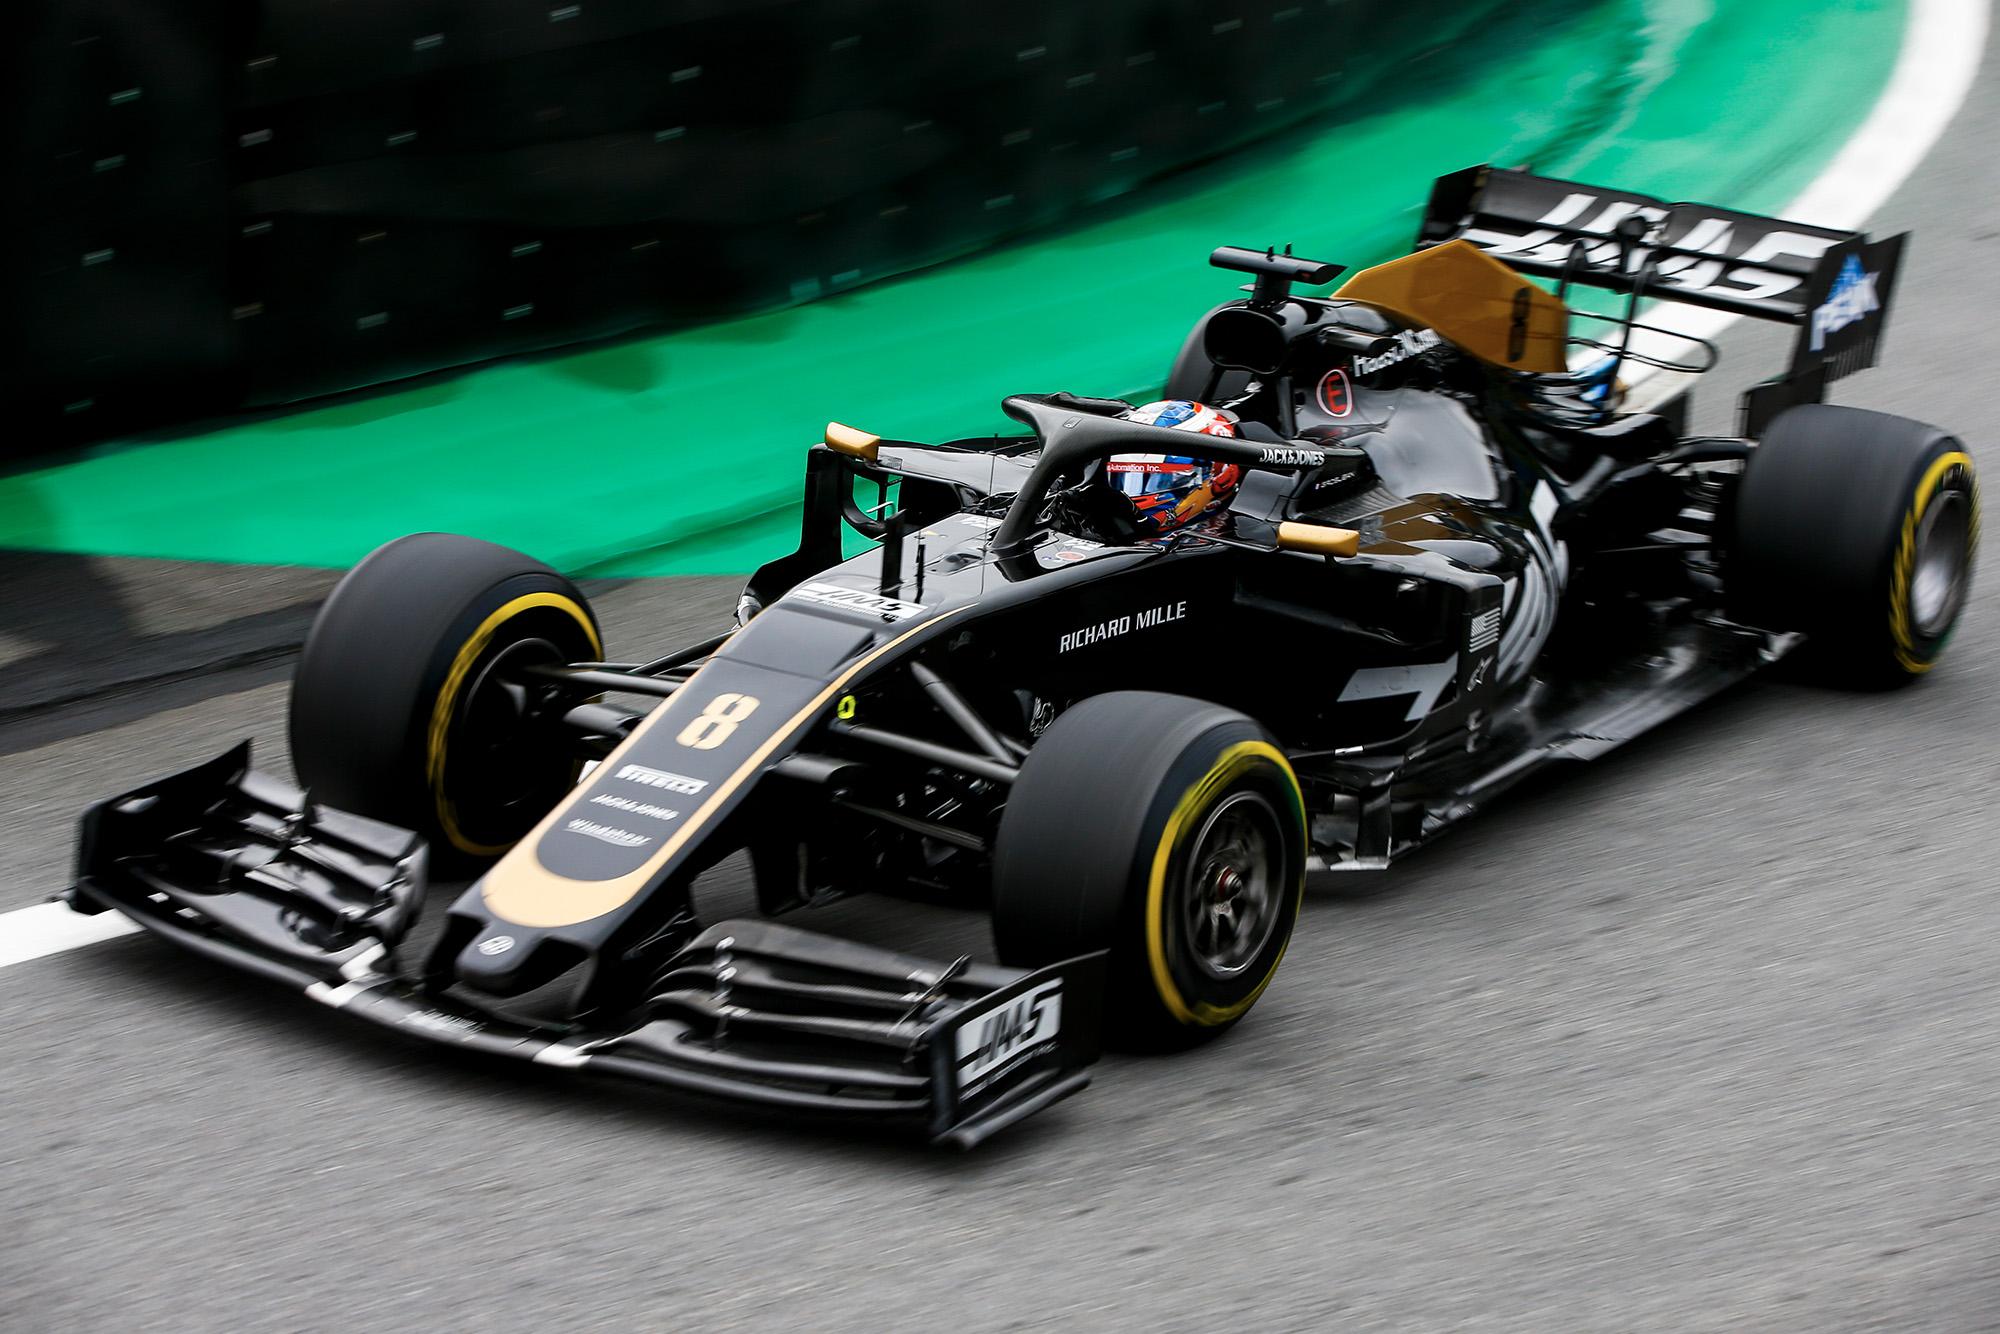 Romain Grosjean during practice for the 2019 F1 Brazilian Grand Prix